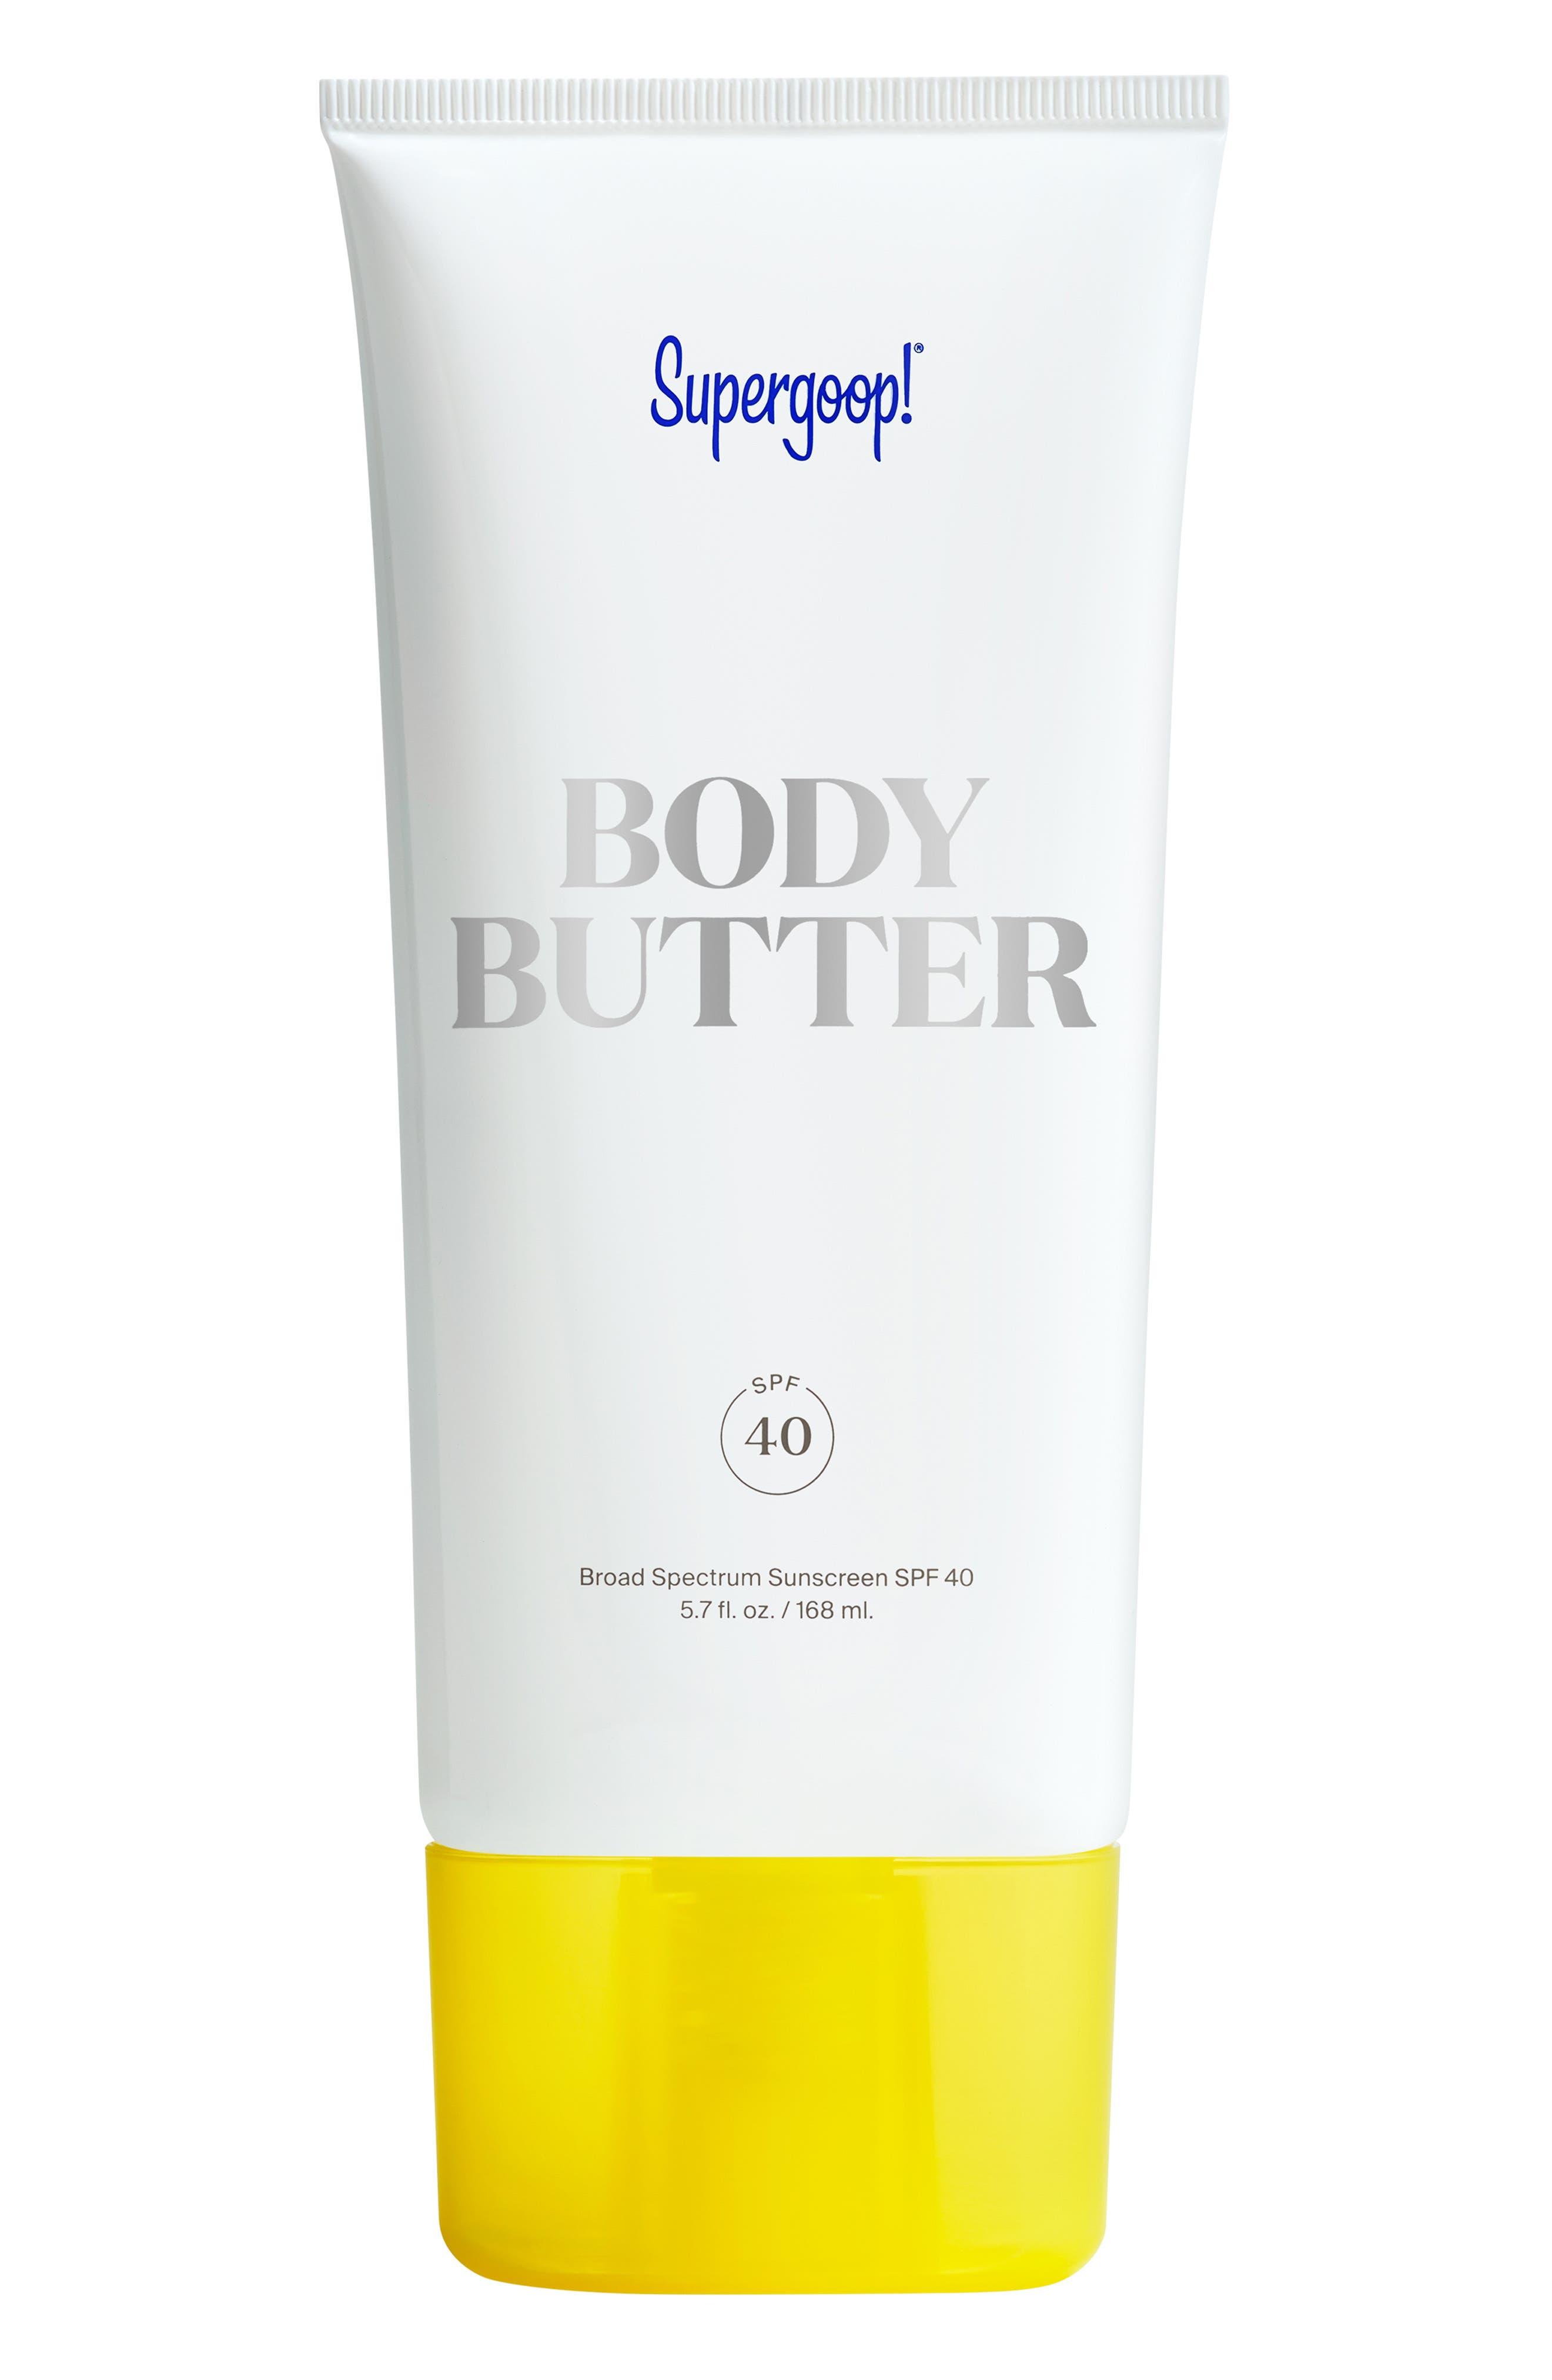 Supergoop! Body Butter Broad Spectrum Sunscreen SPF 40   Nordstrom